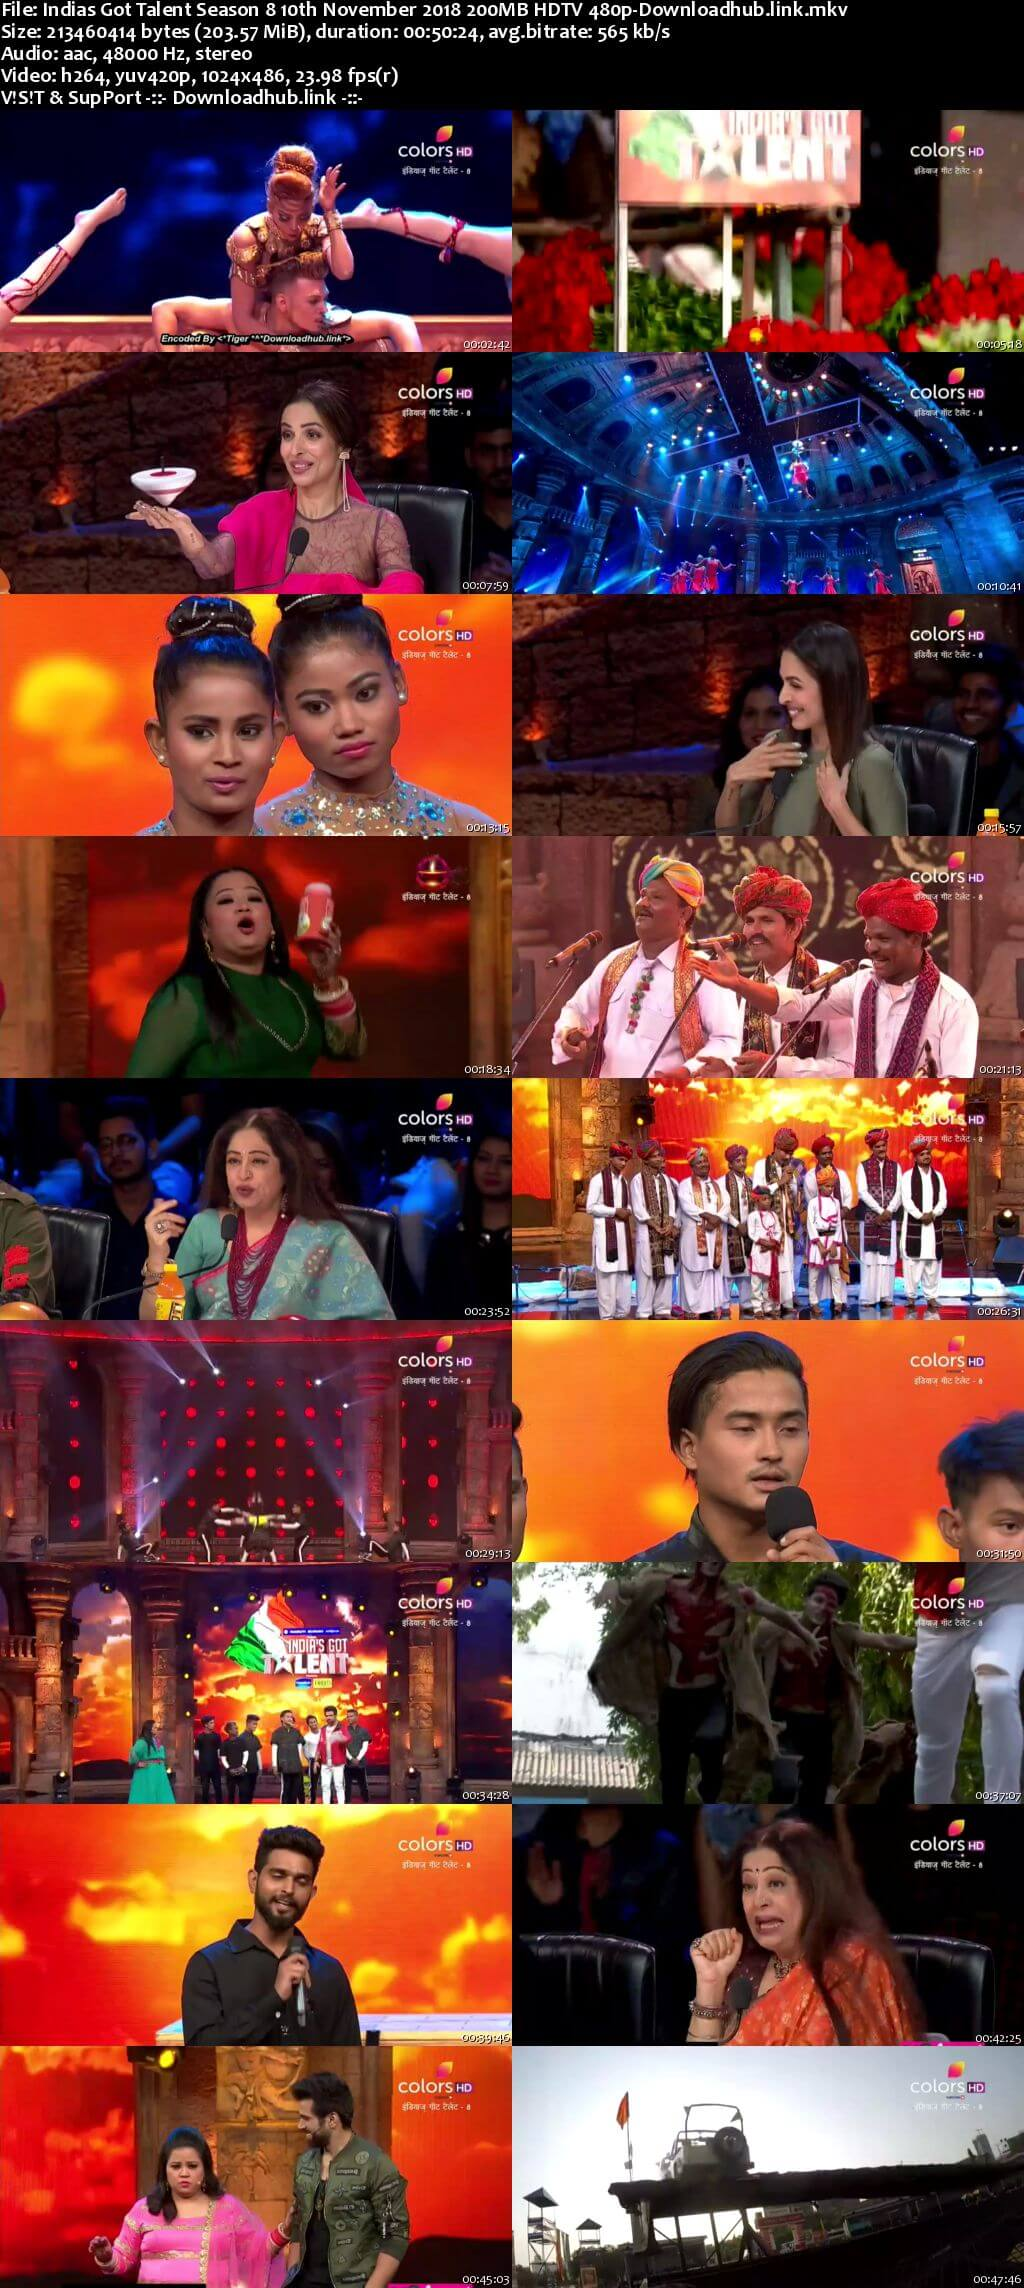 Indias Got Talent Season 8 10 November 2018 Episode 07 HDTV 480p